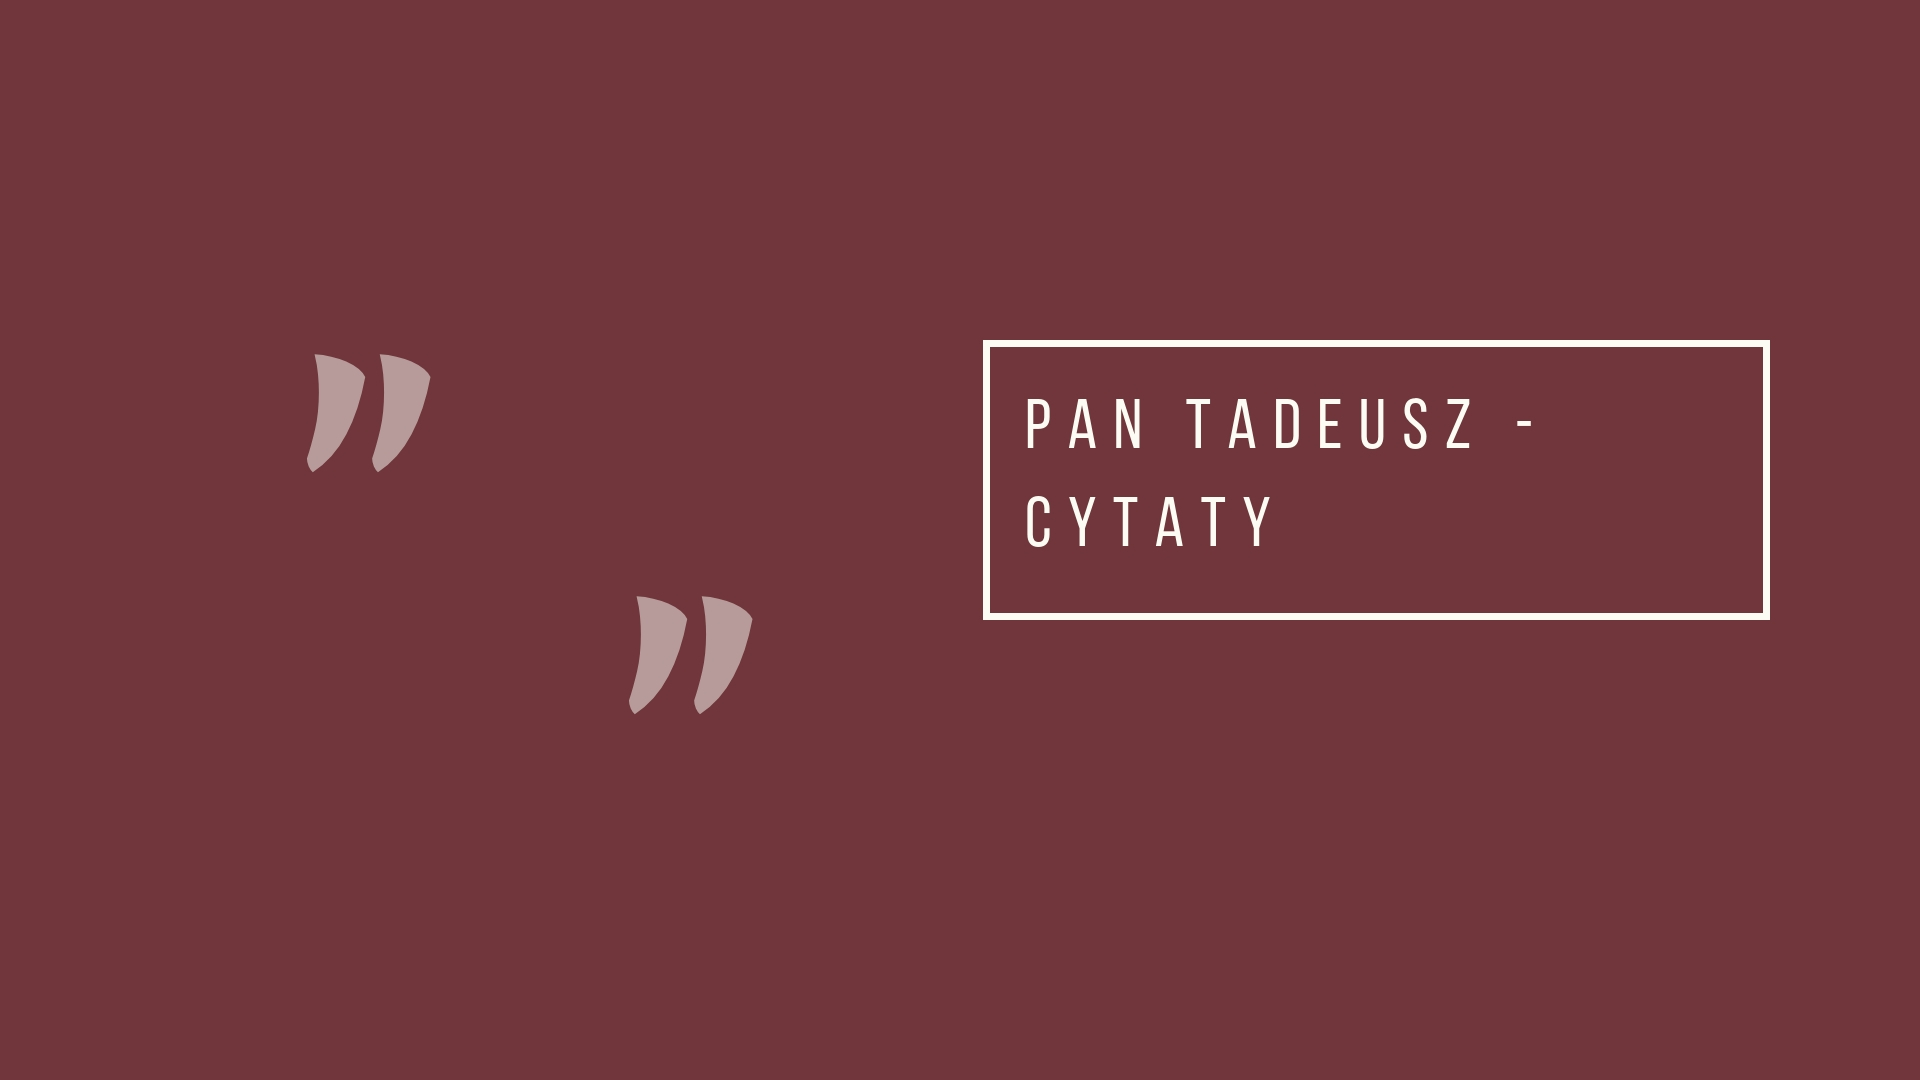 Pan Tadeusz - cytaty